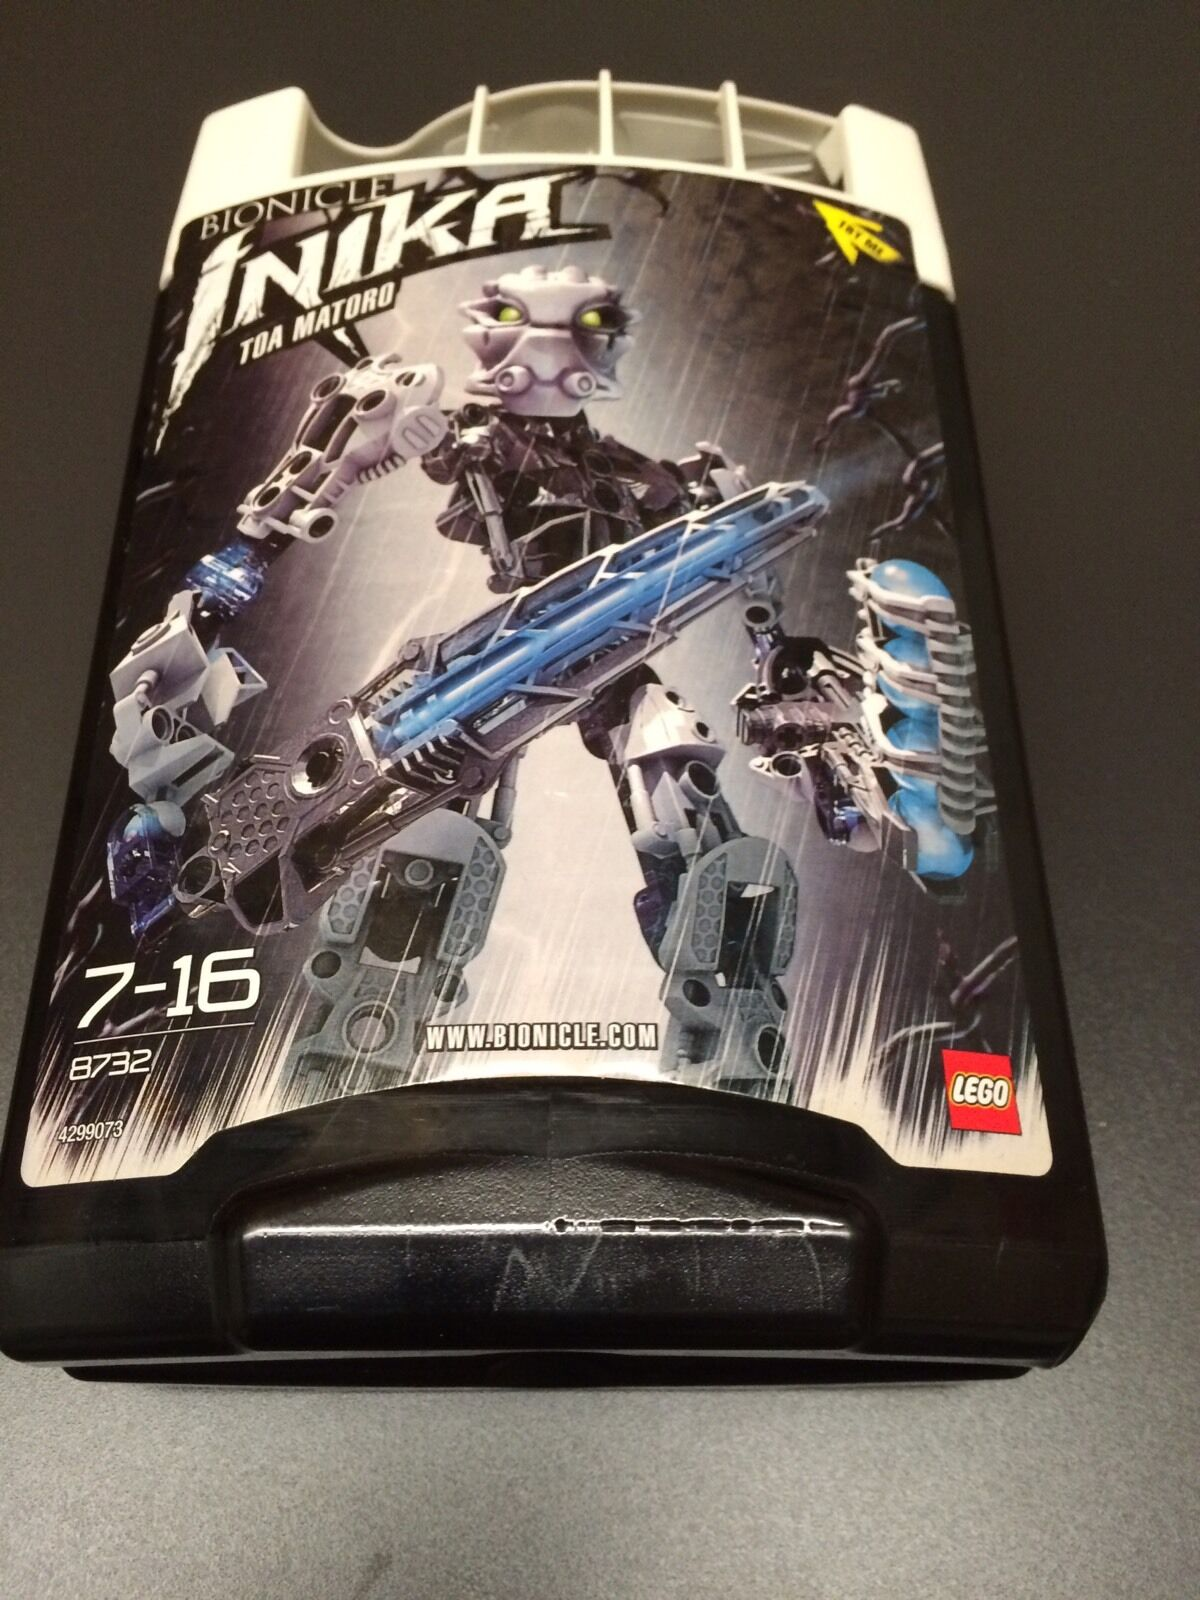 Lego 8732 Bionicle Toa Matoro NEU&OVP RARITÄT